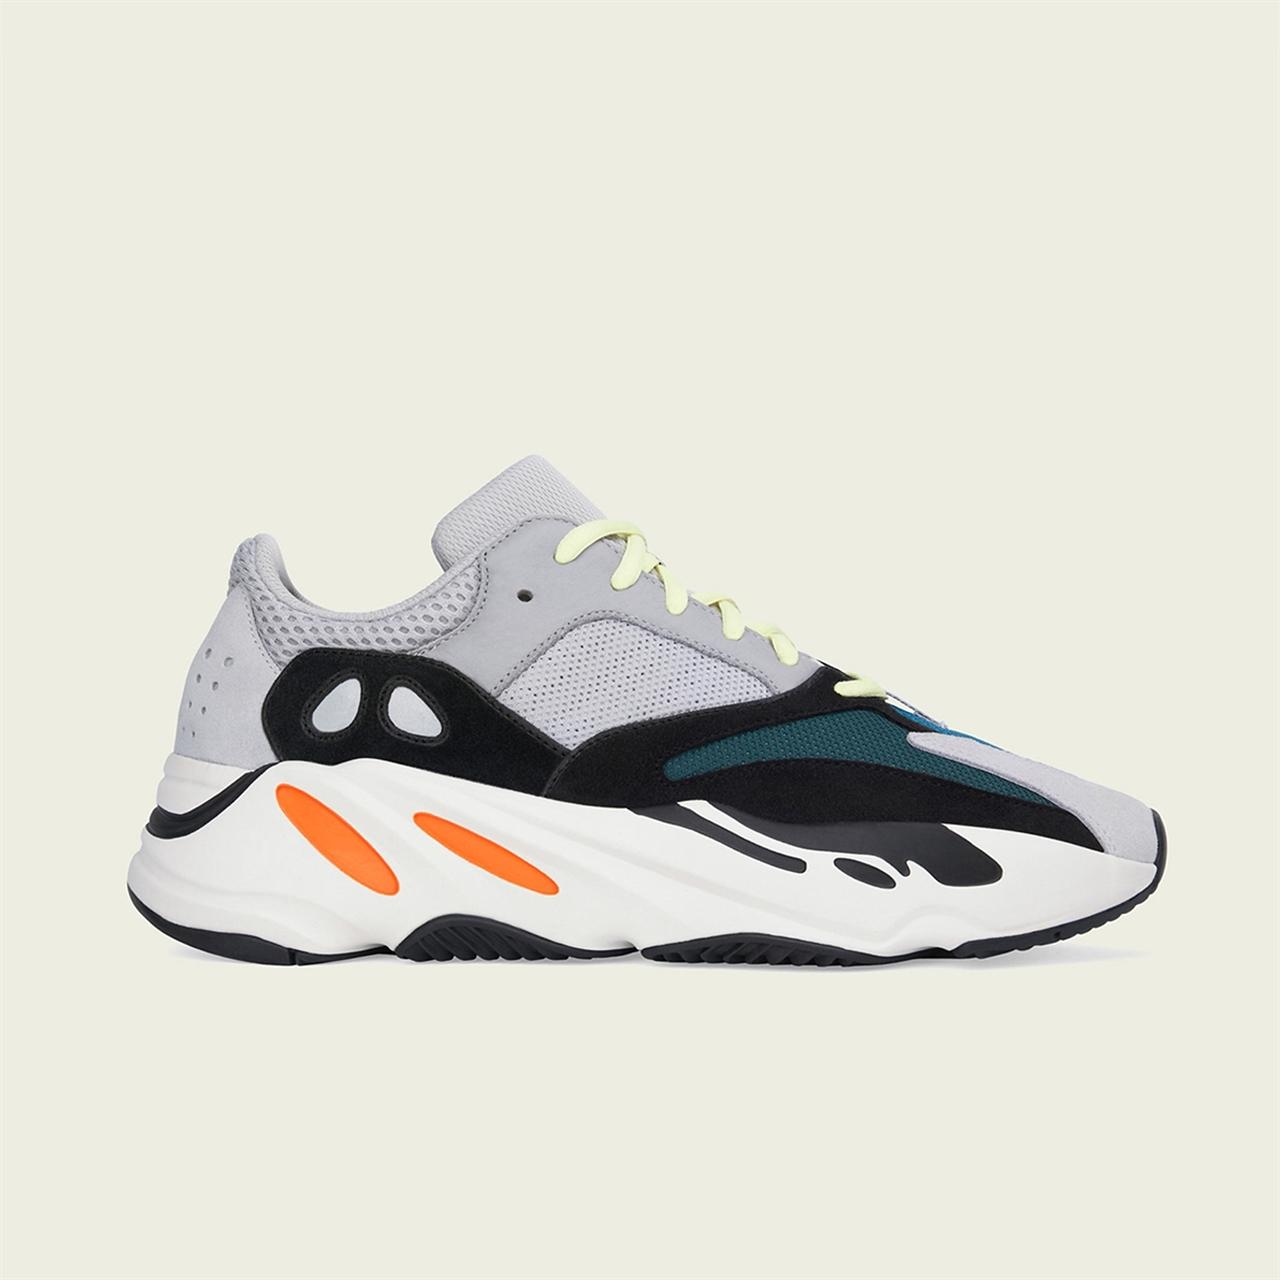 264755be3dd Shelta - Adidas Originals Yeezy Boost 700 (B75571)